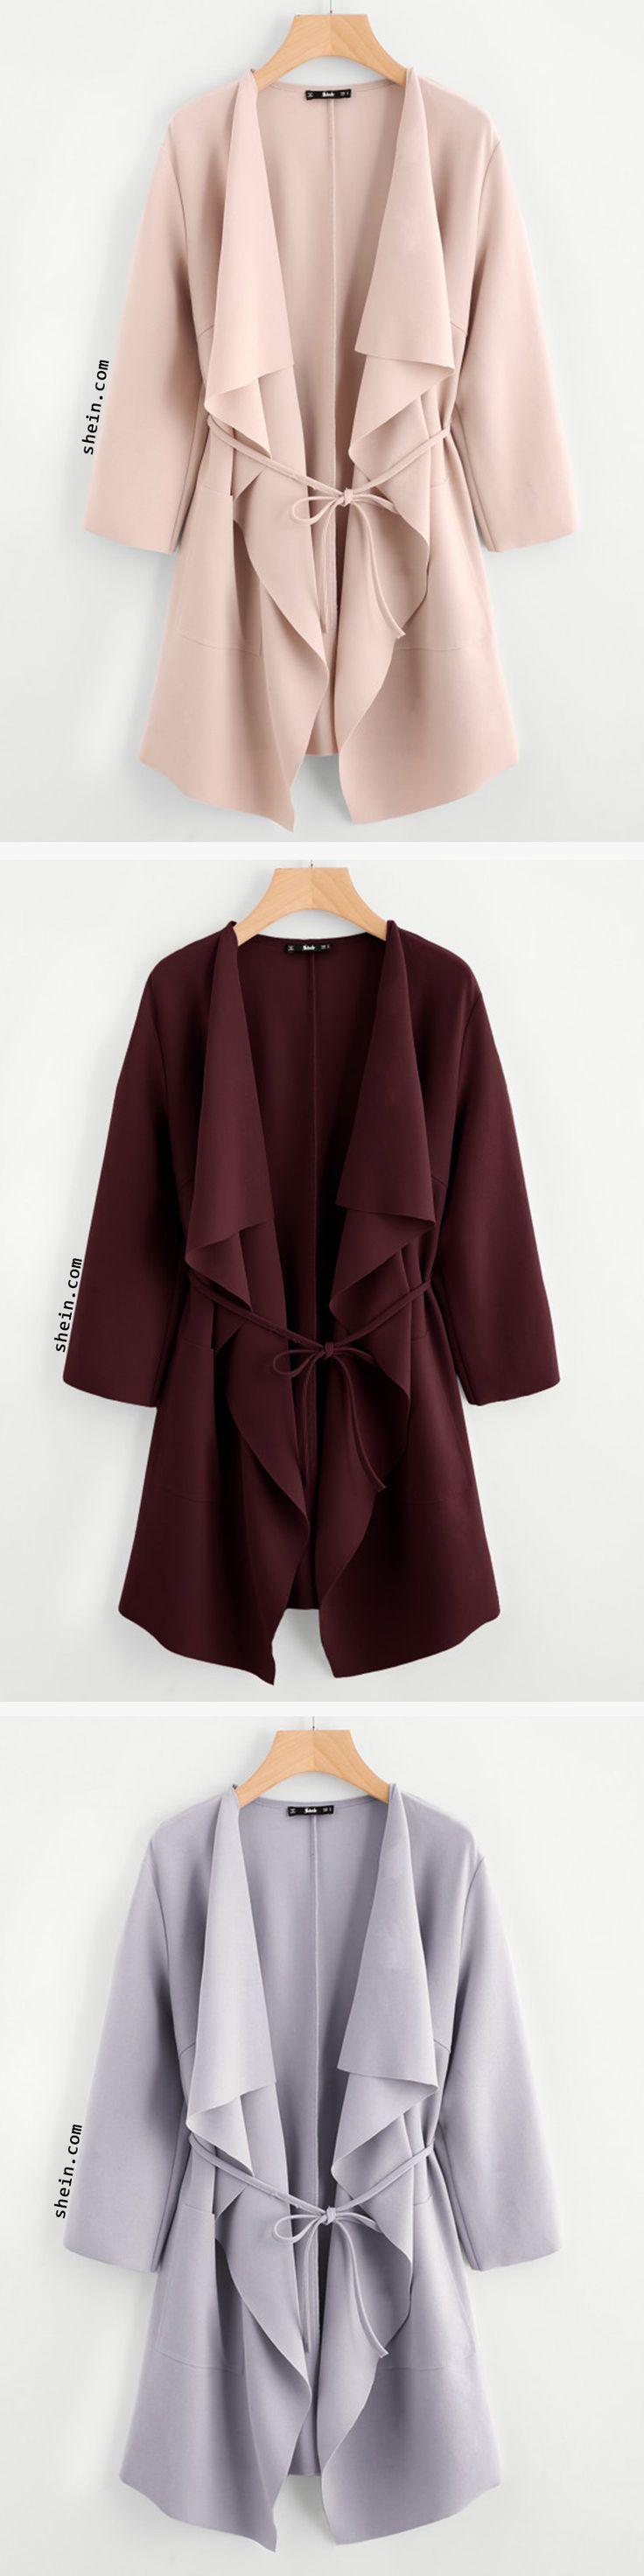 Waterfall Collar Pocket Front Wrap Coat